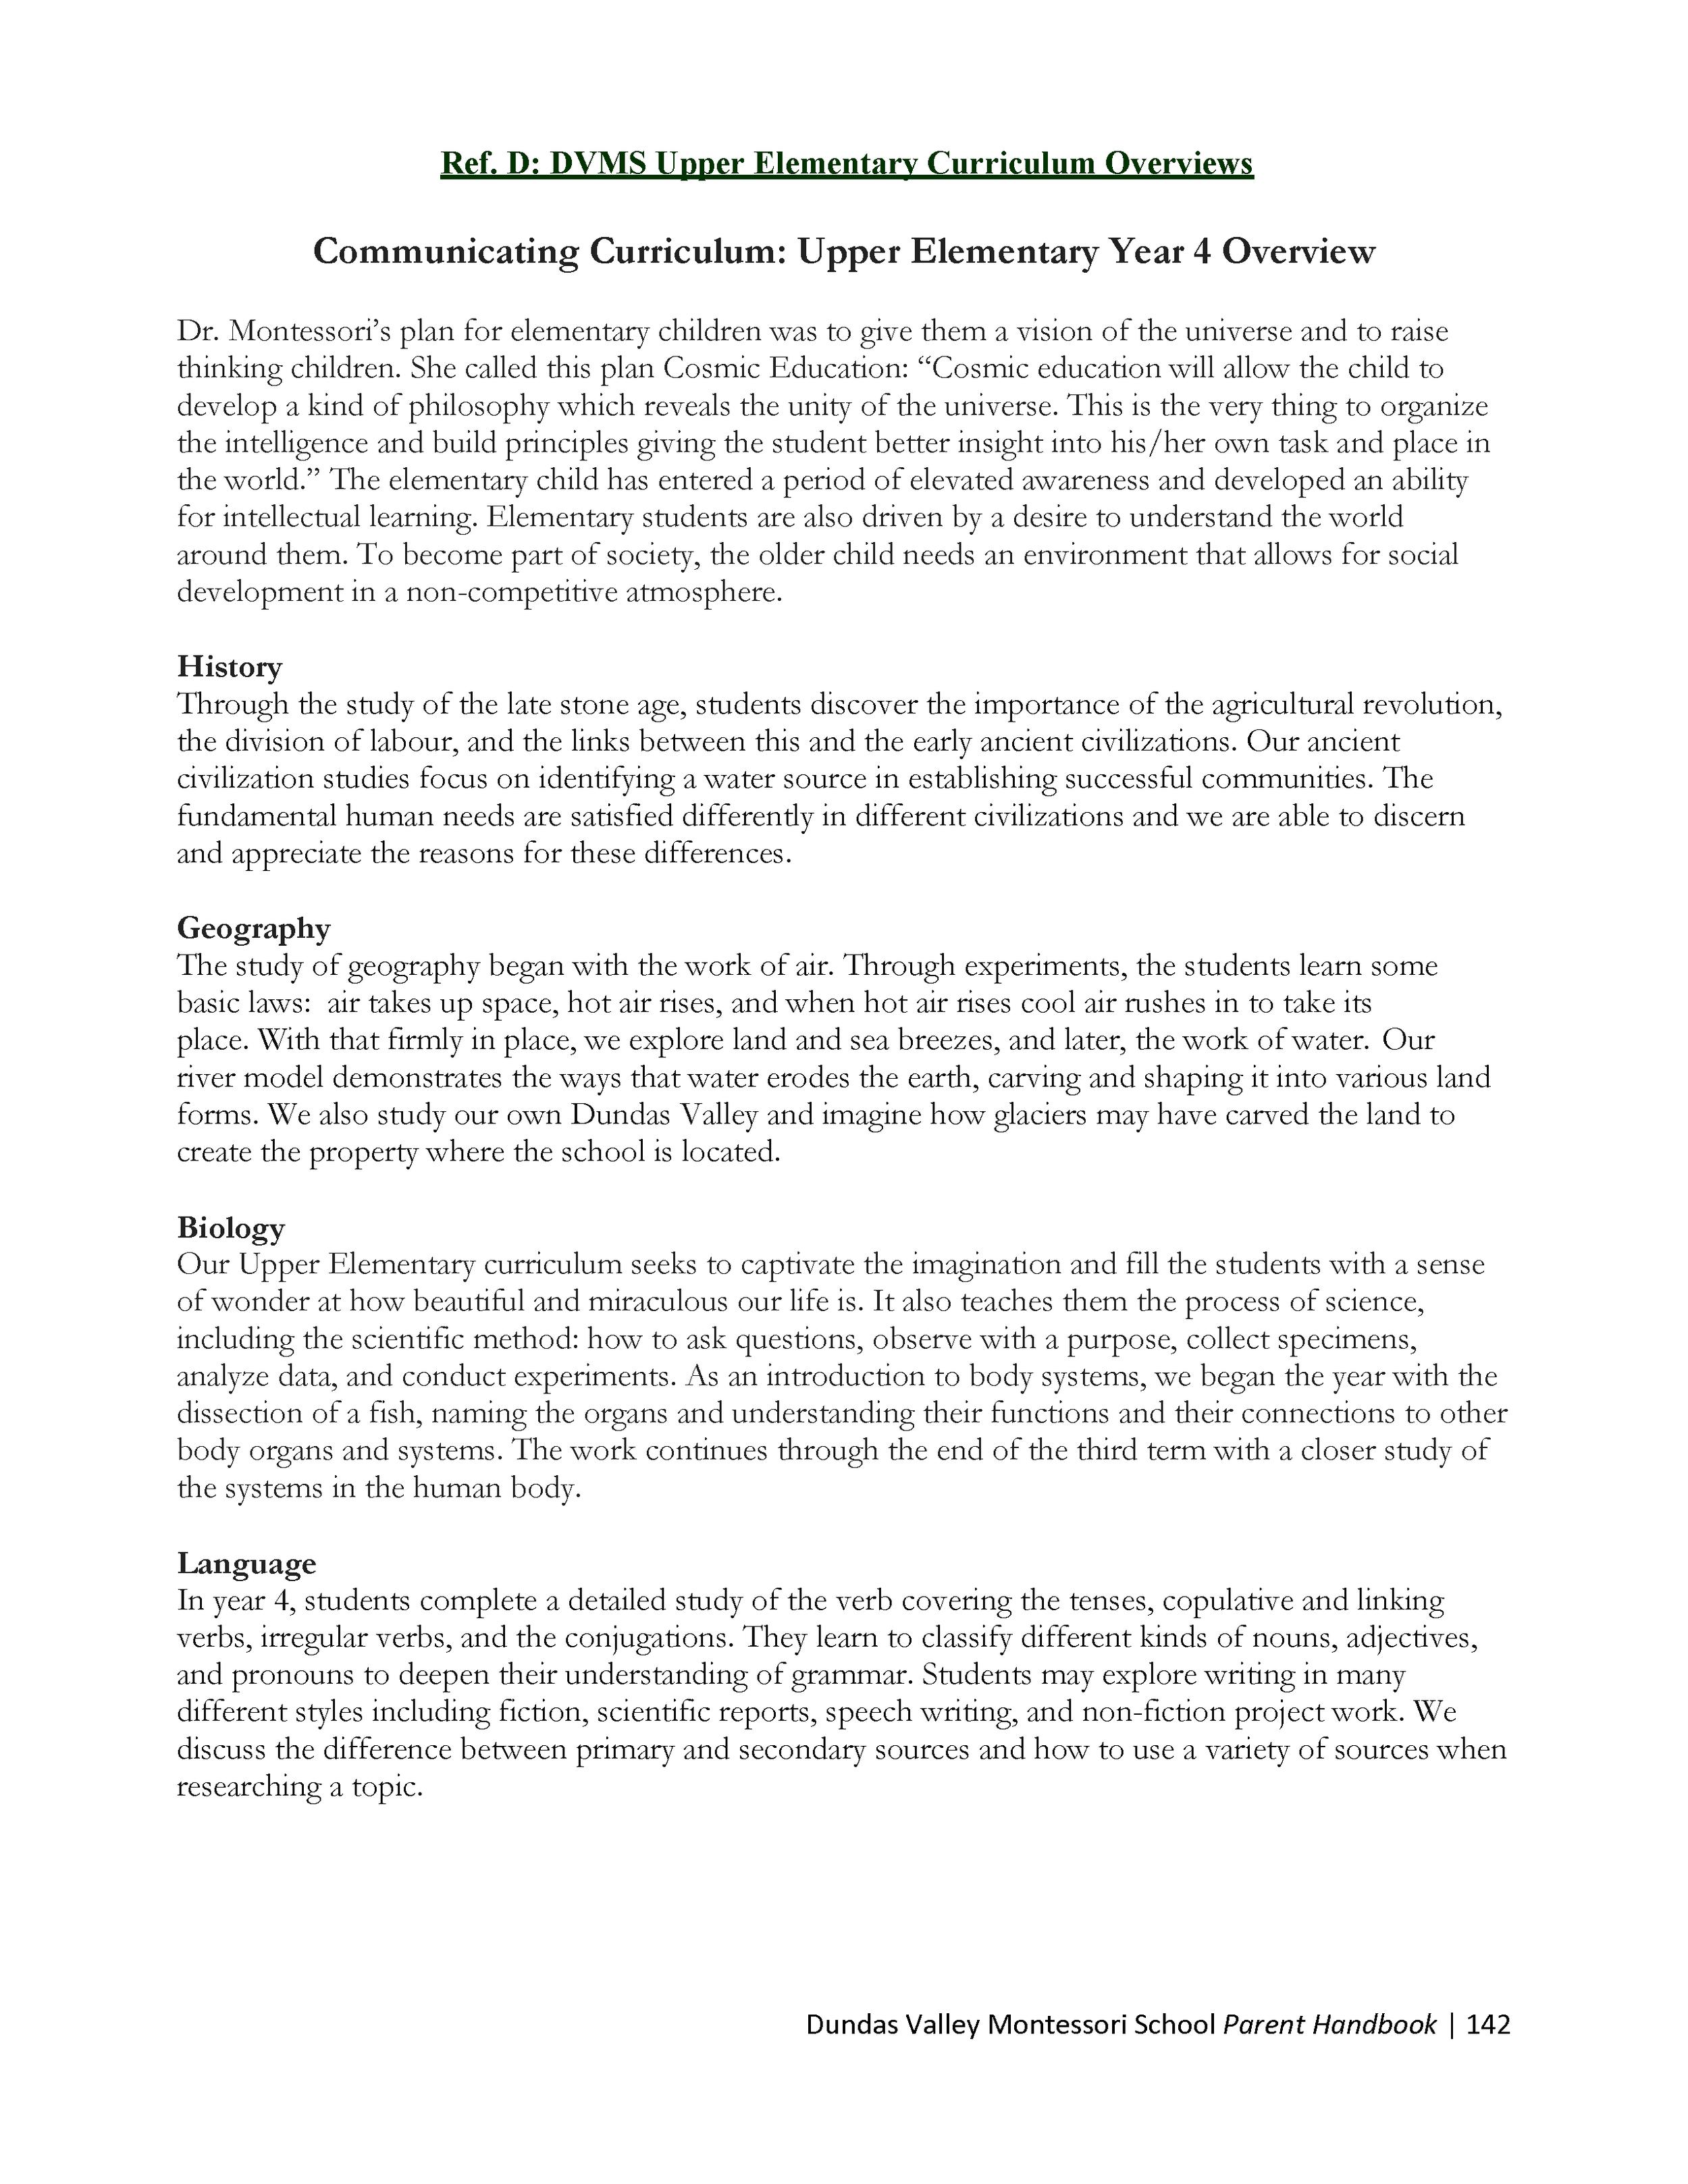 DVMS-Parent-Handbook-19-20_Page_144.png